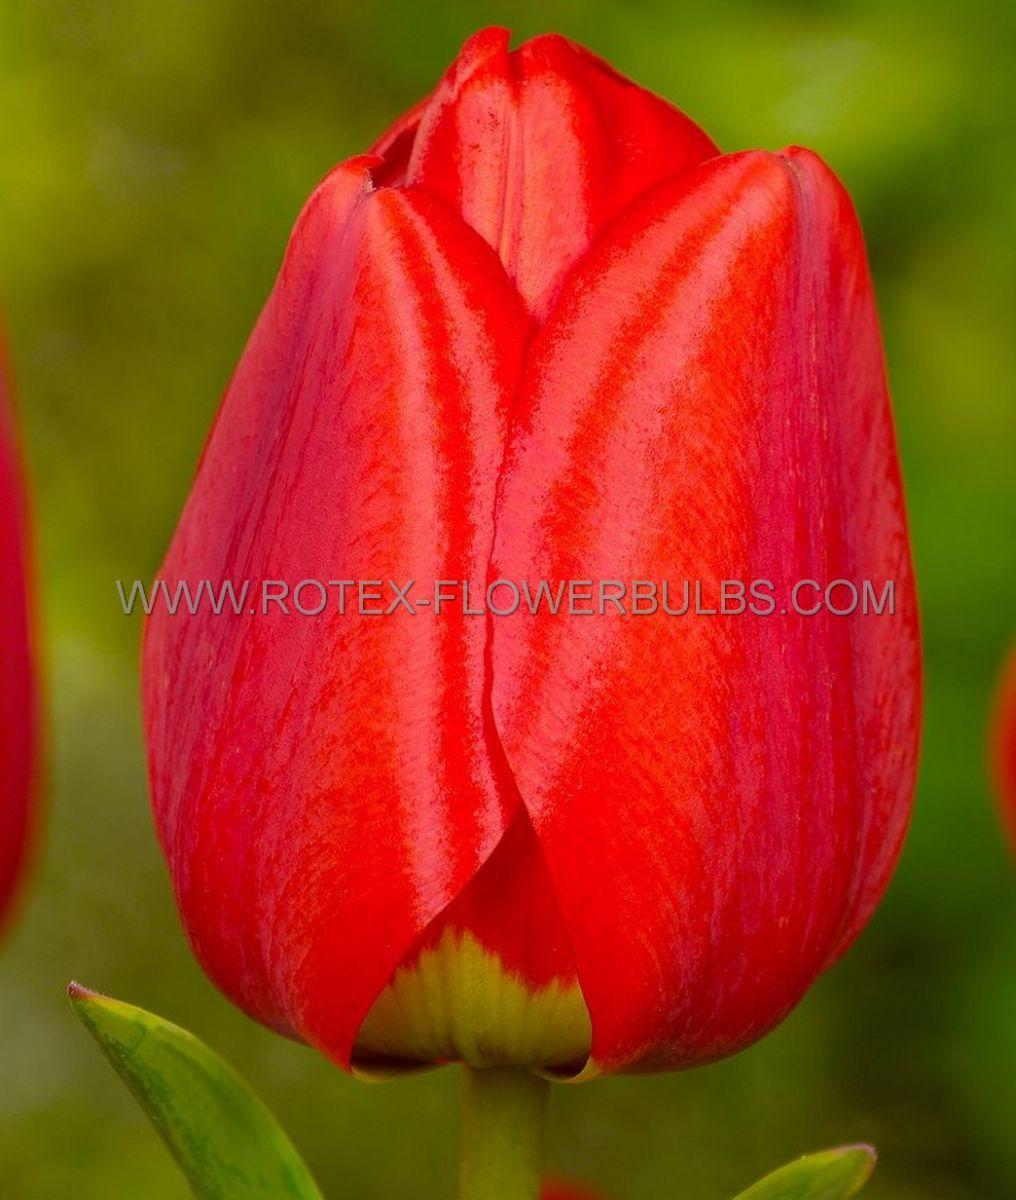 tulipa darwin hybrid parade jumbo size 14 cm 300 pplastic tray